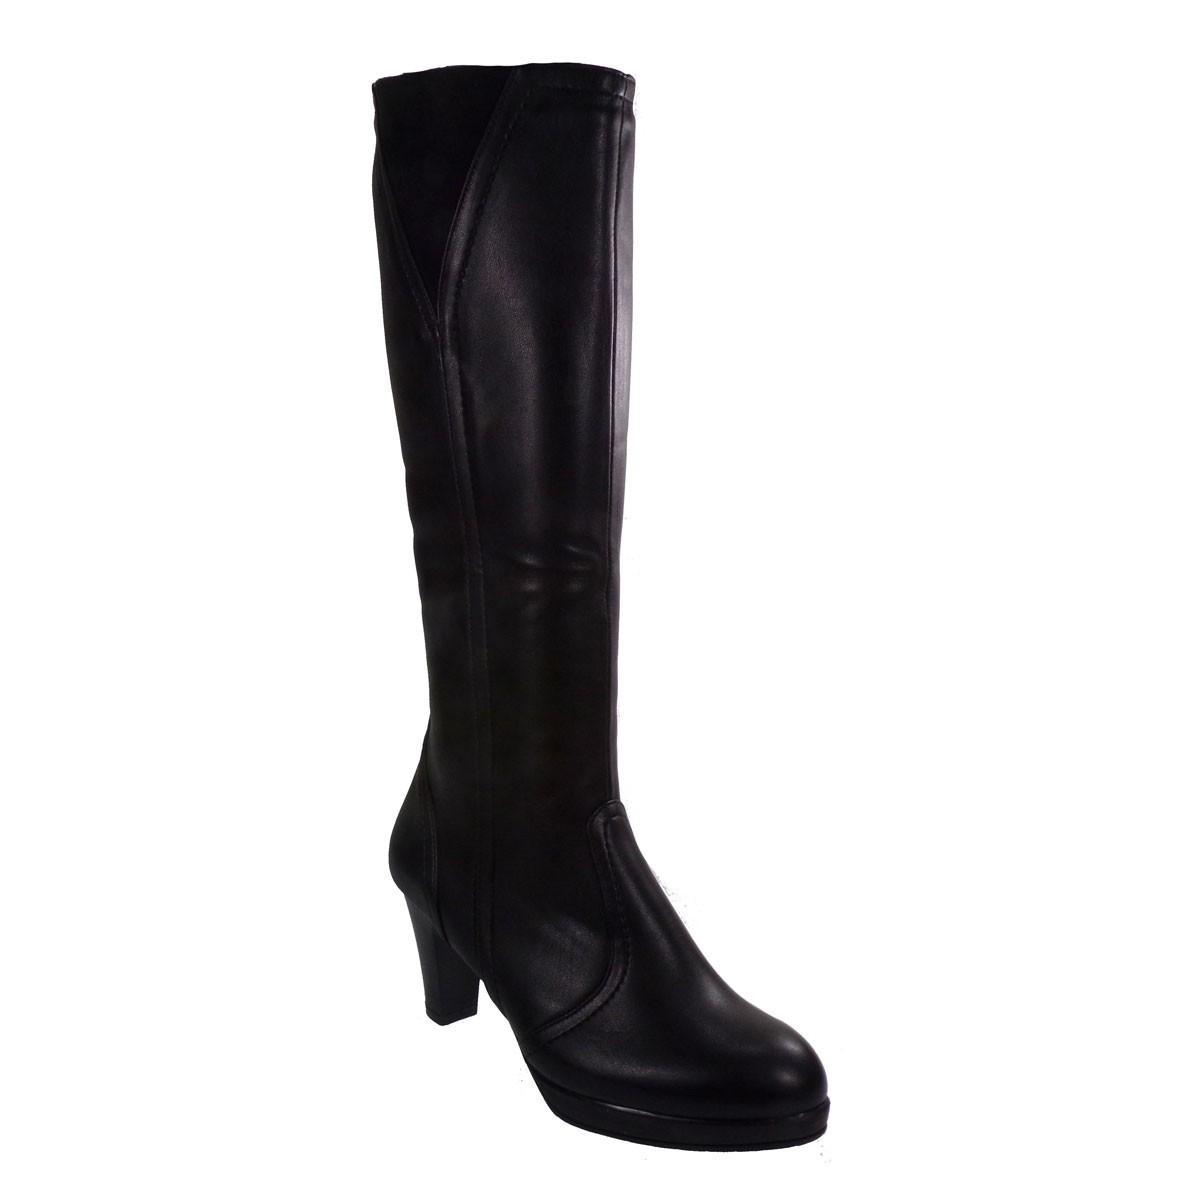 Katia shoes Γυναικεία Παπούτσια Μπότες 79-5098 Μαυρο